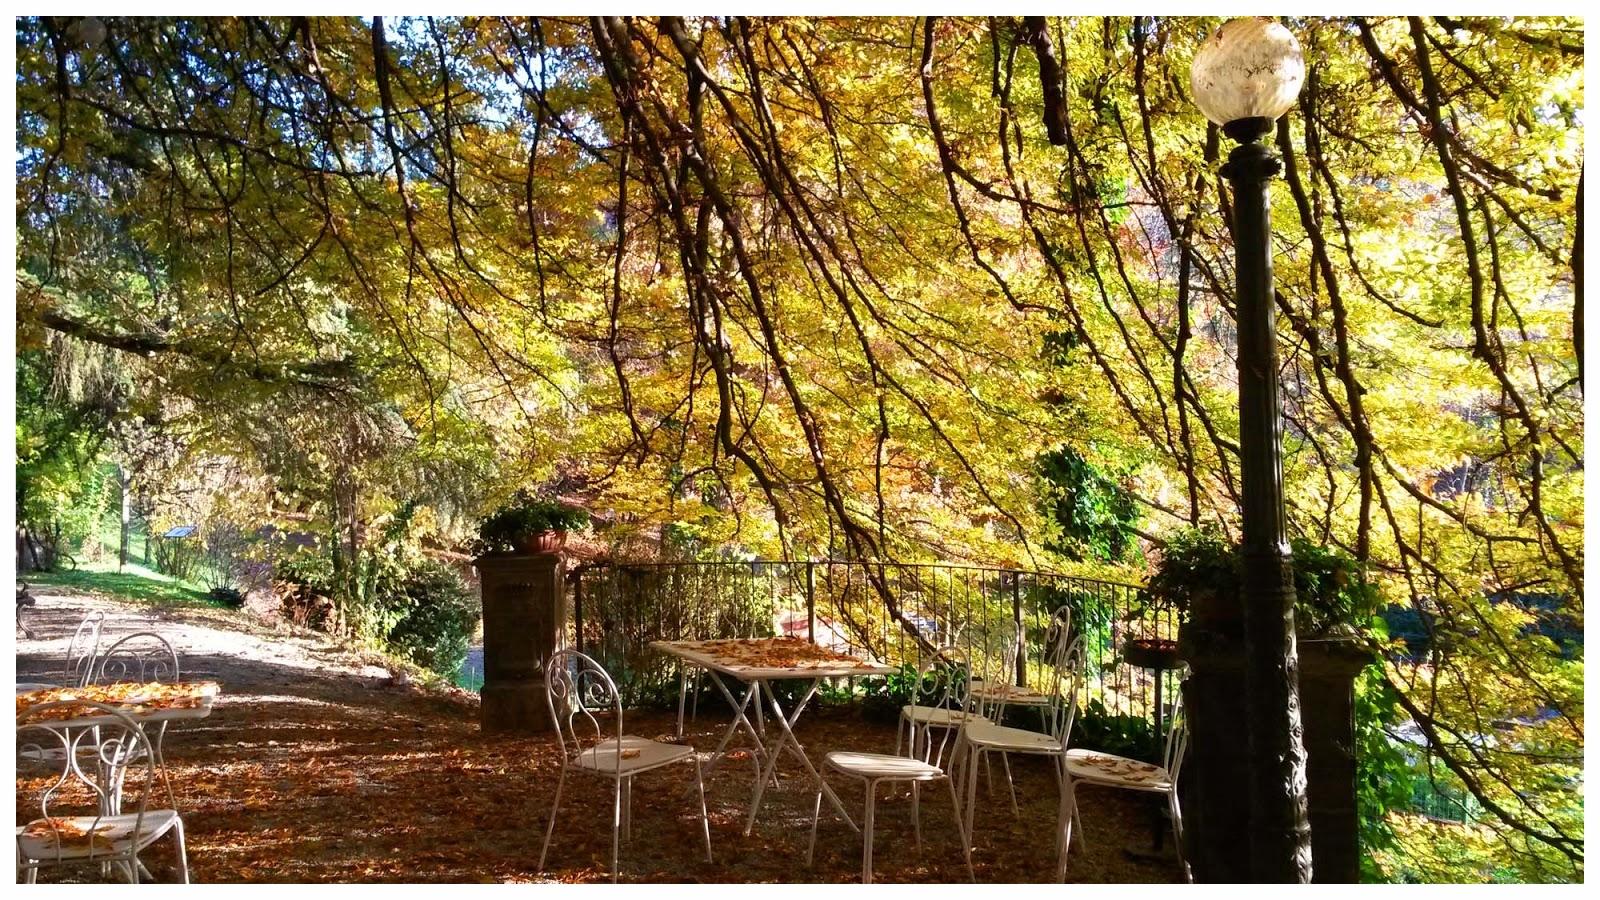 sentieri percorsi itinerari langhe e roero langa romantica bosco dei pensieri serralunga alba .jpg